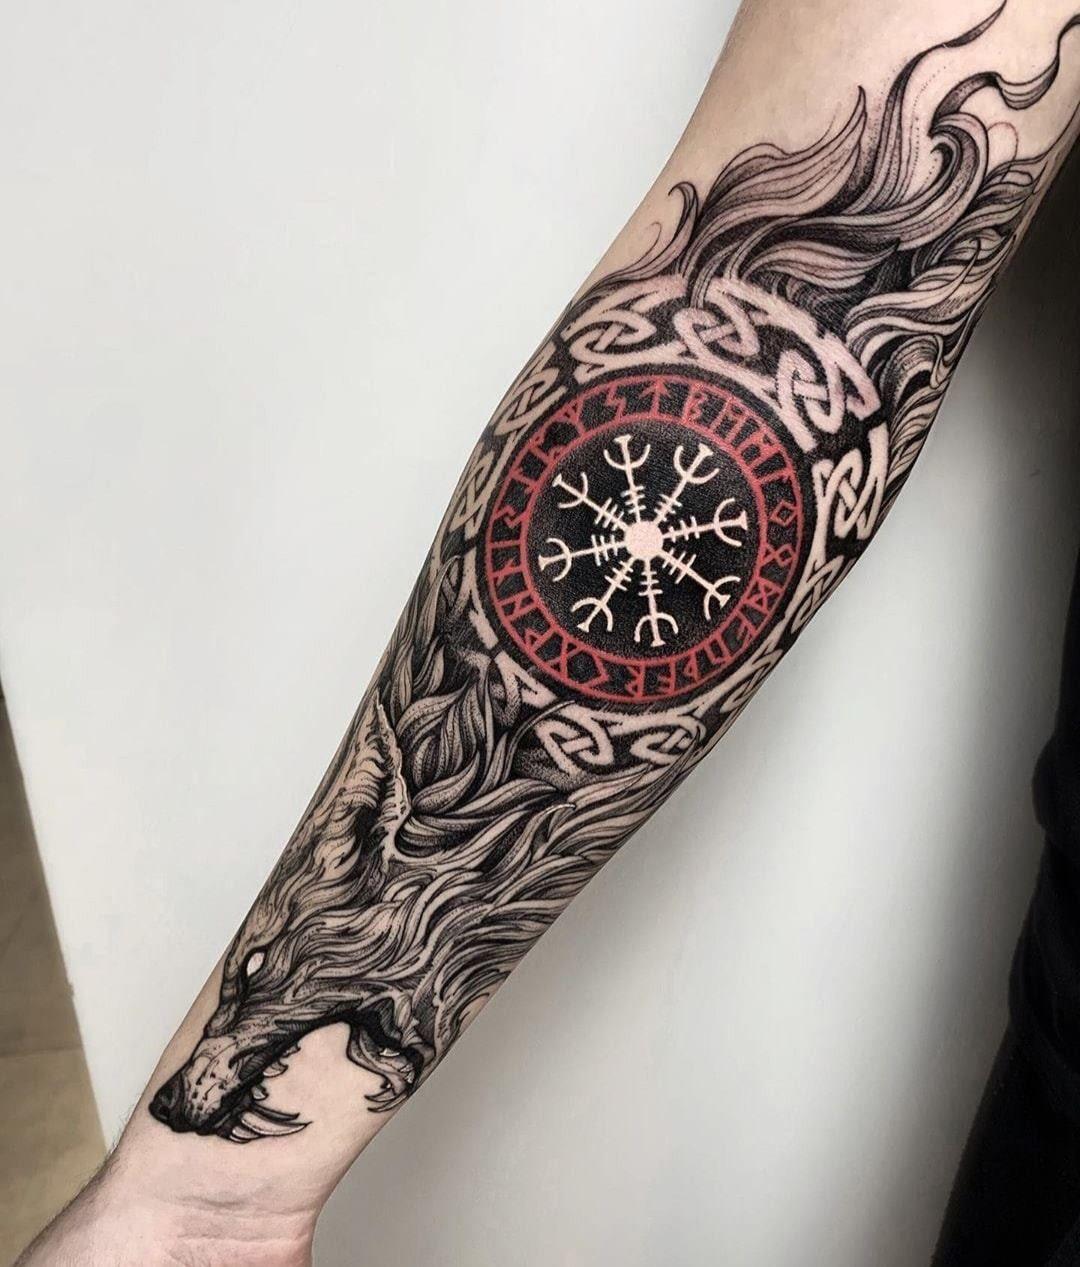 Fenrir Hand Tattoos Tattoos For Guys Sleeve Tattoos